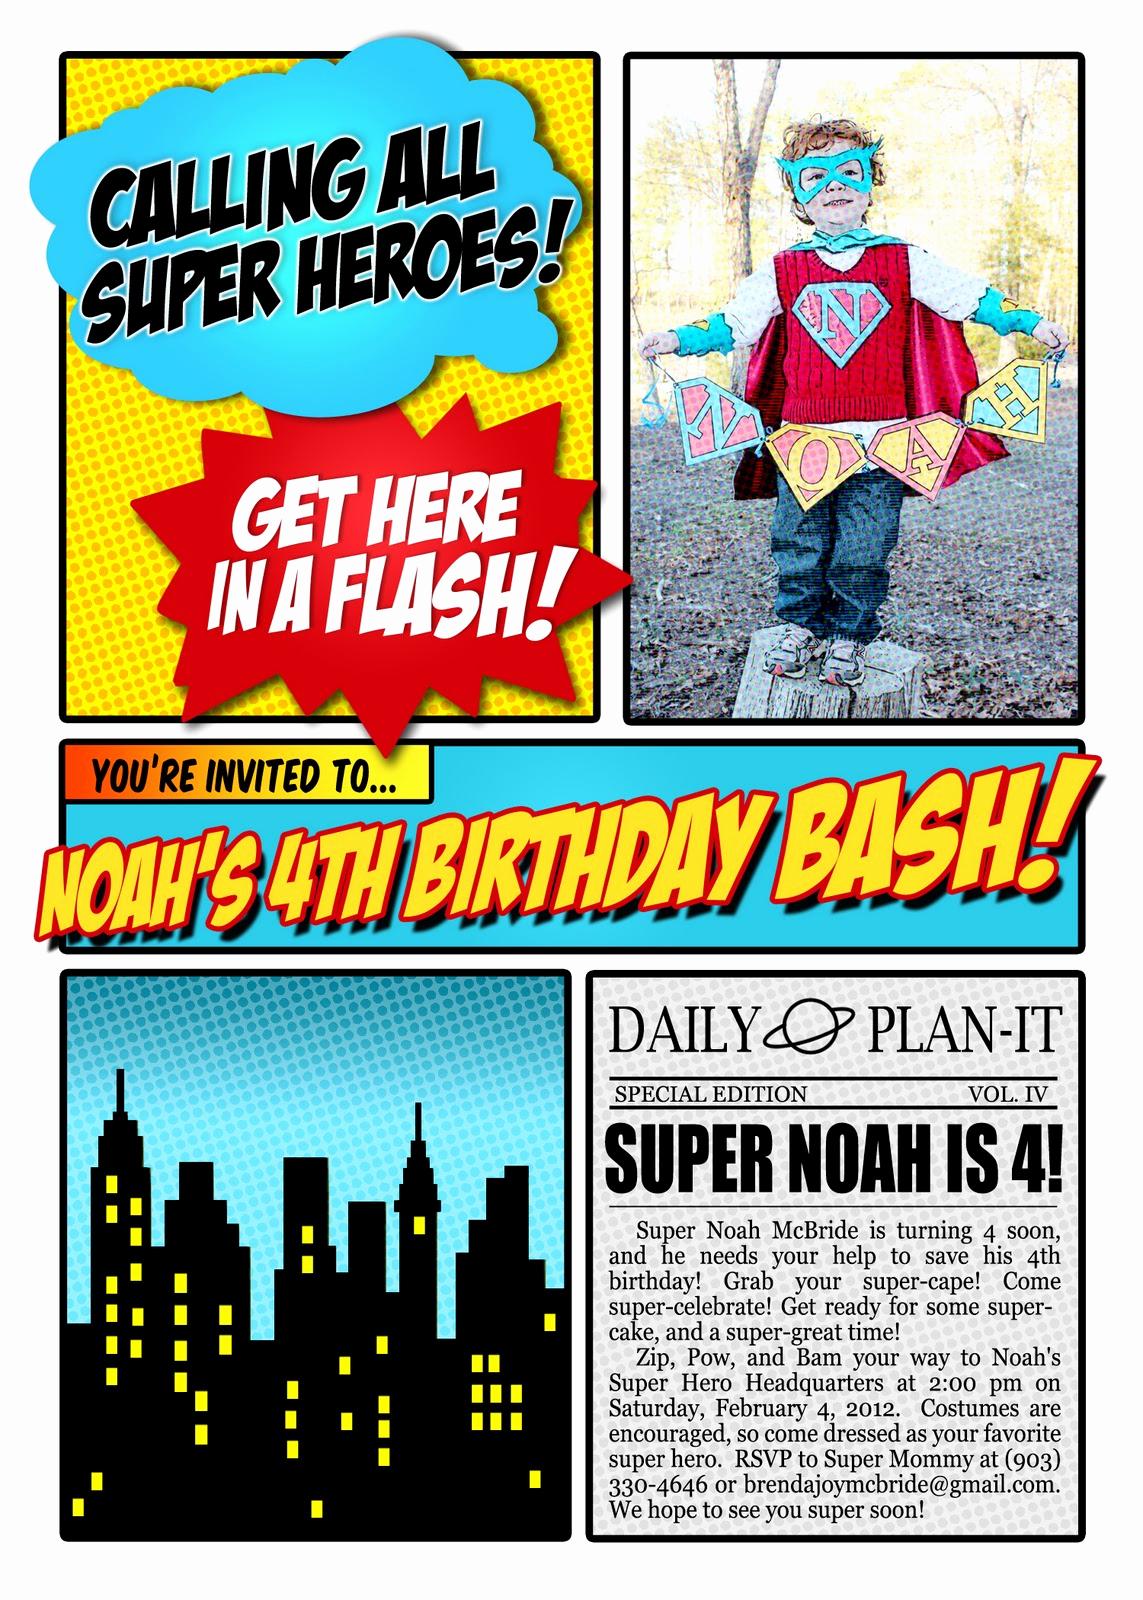 Calling All Superheroes Invitation Lovely Choosing Joy today Super Noah S 4th Birthday Invitation